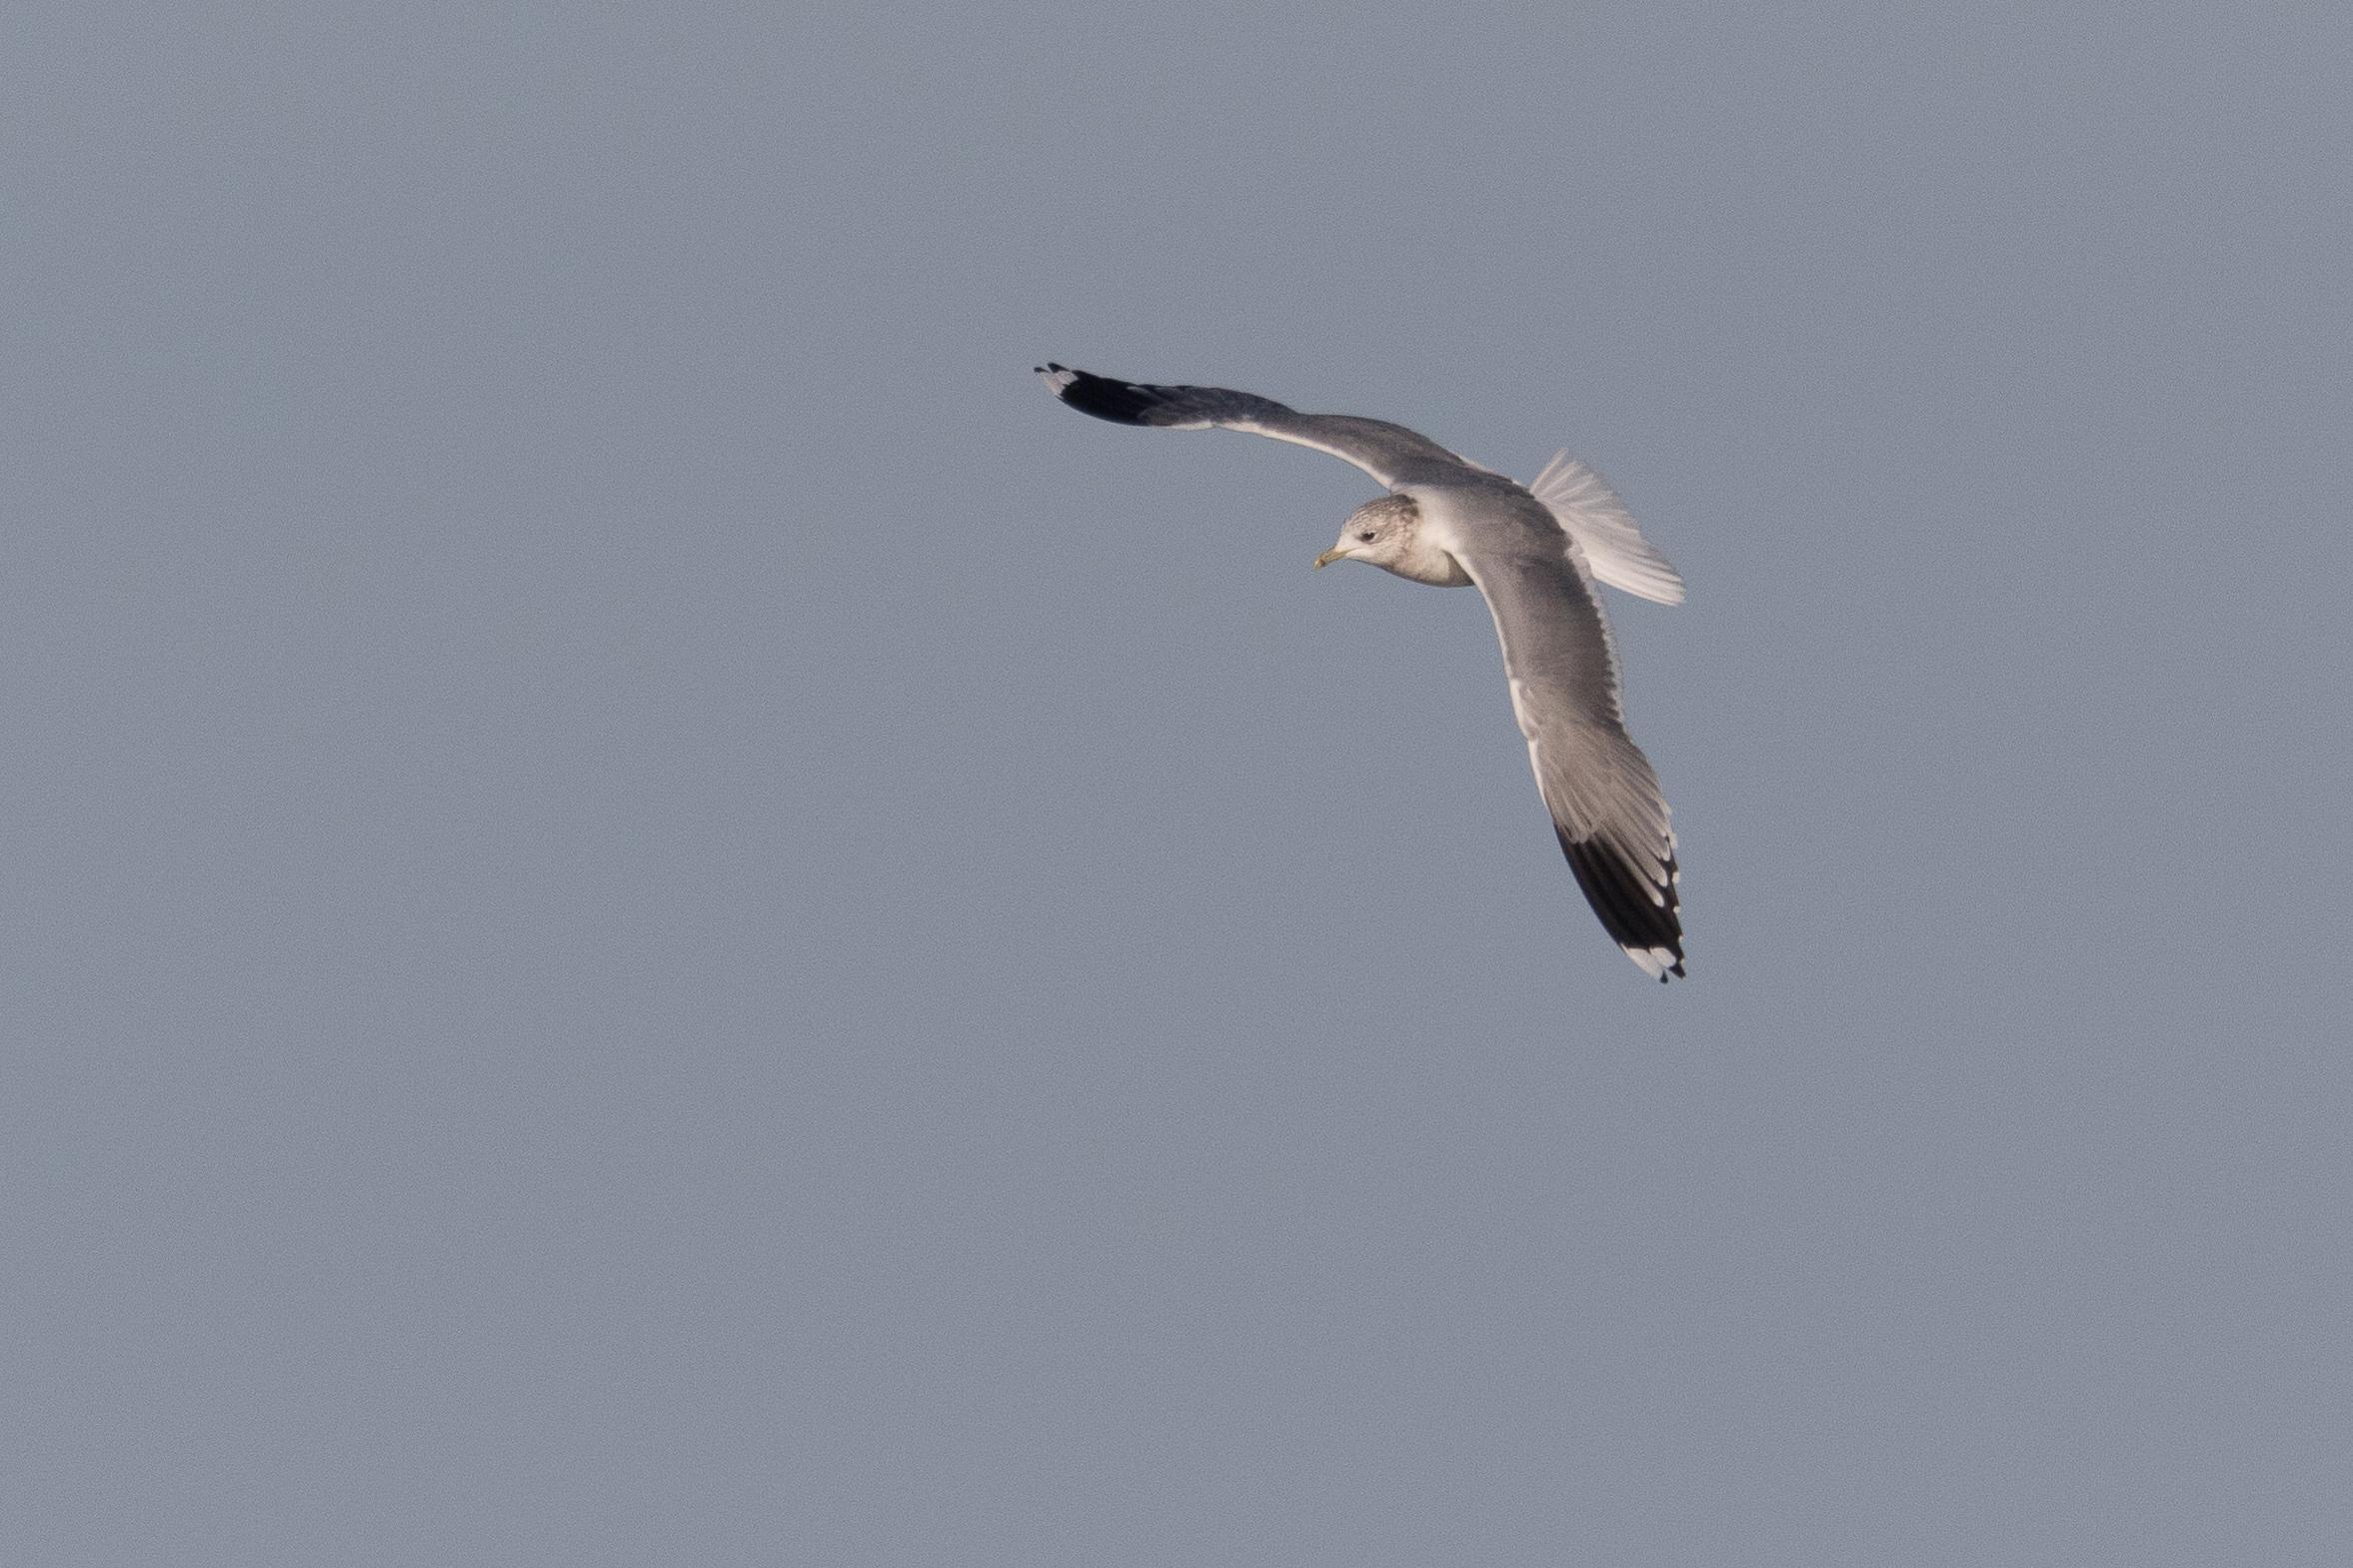 20170124-Common Gull Adult-126.jpg